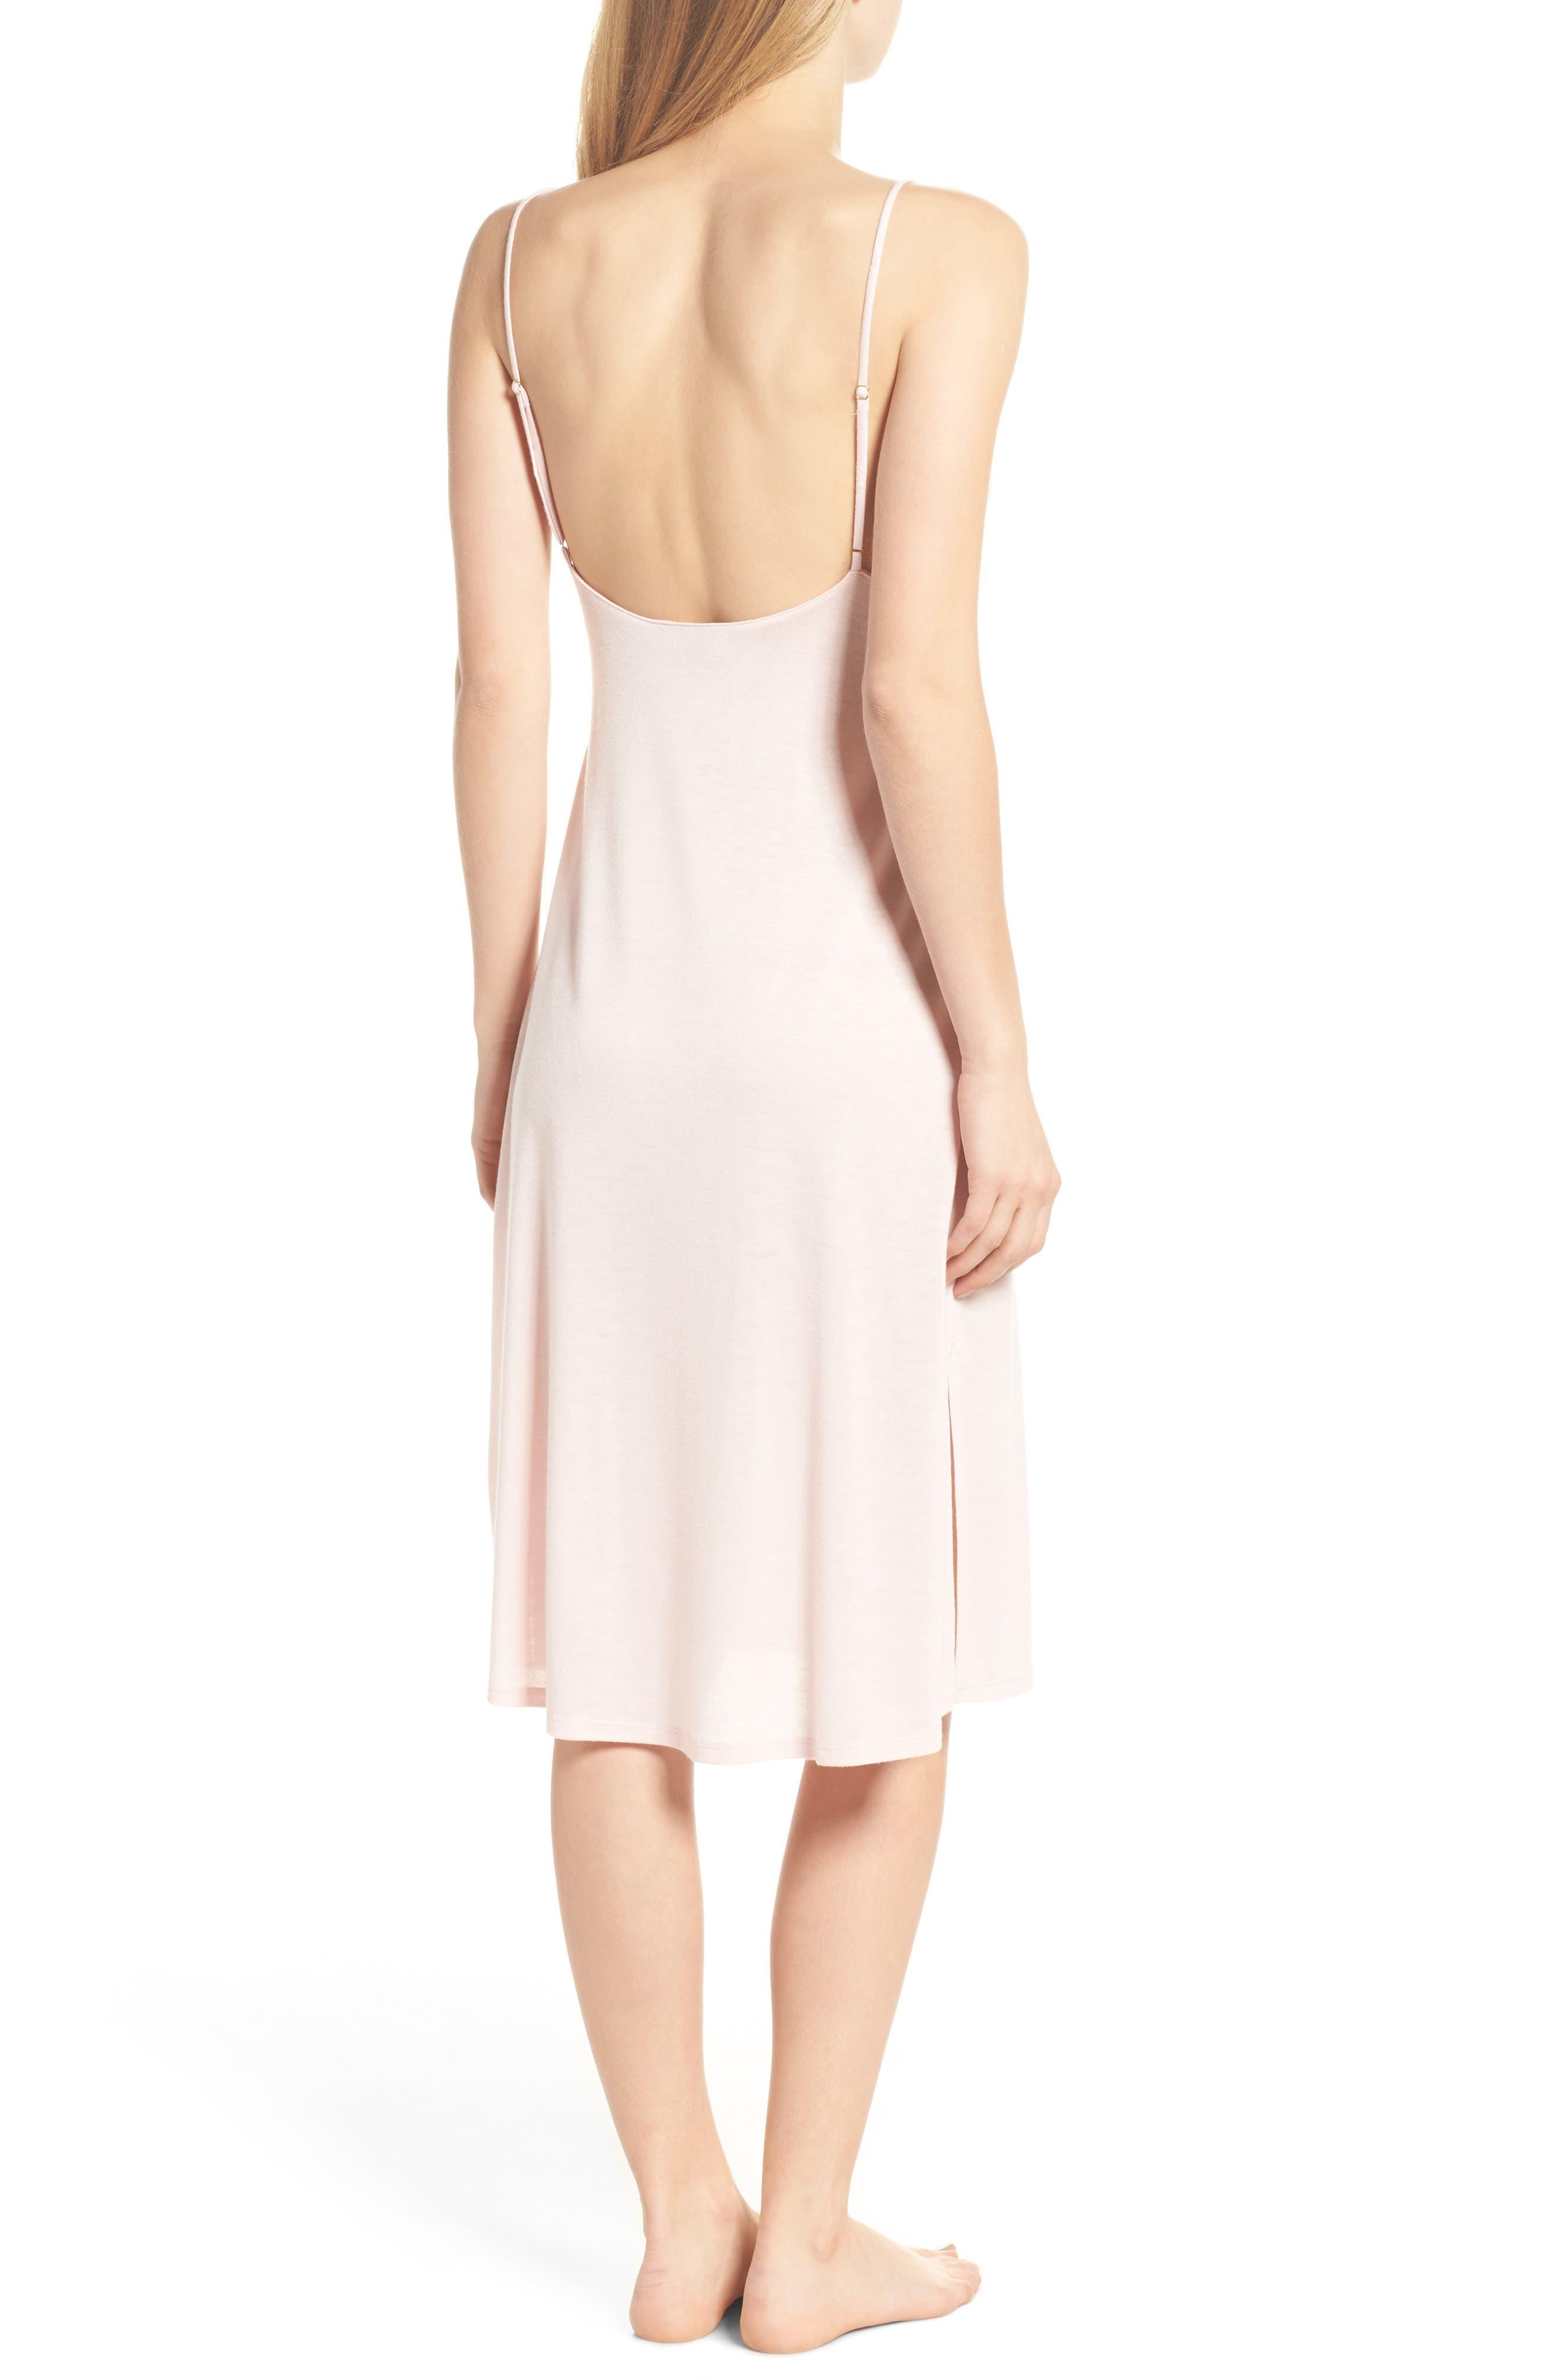 Luxe Shangri-La Nightgown,                             Alternate thumbnail 2, color,                             Blush Pink